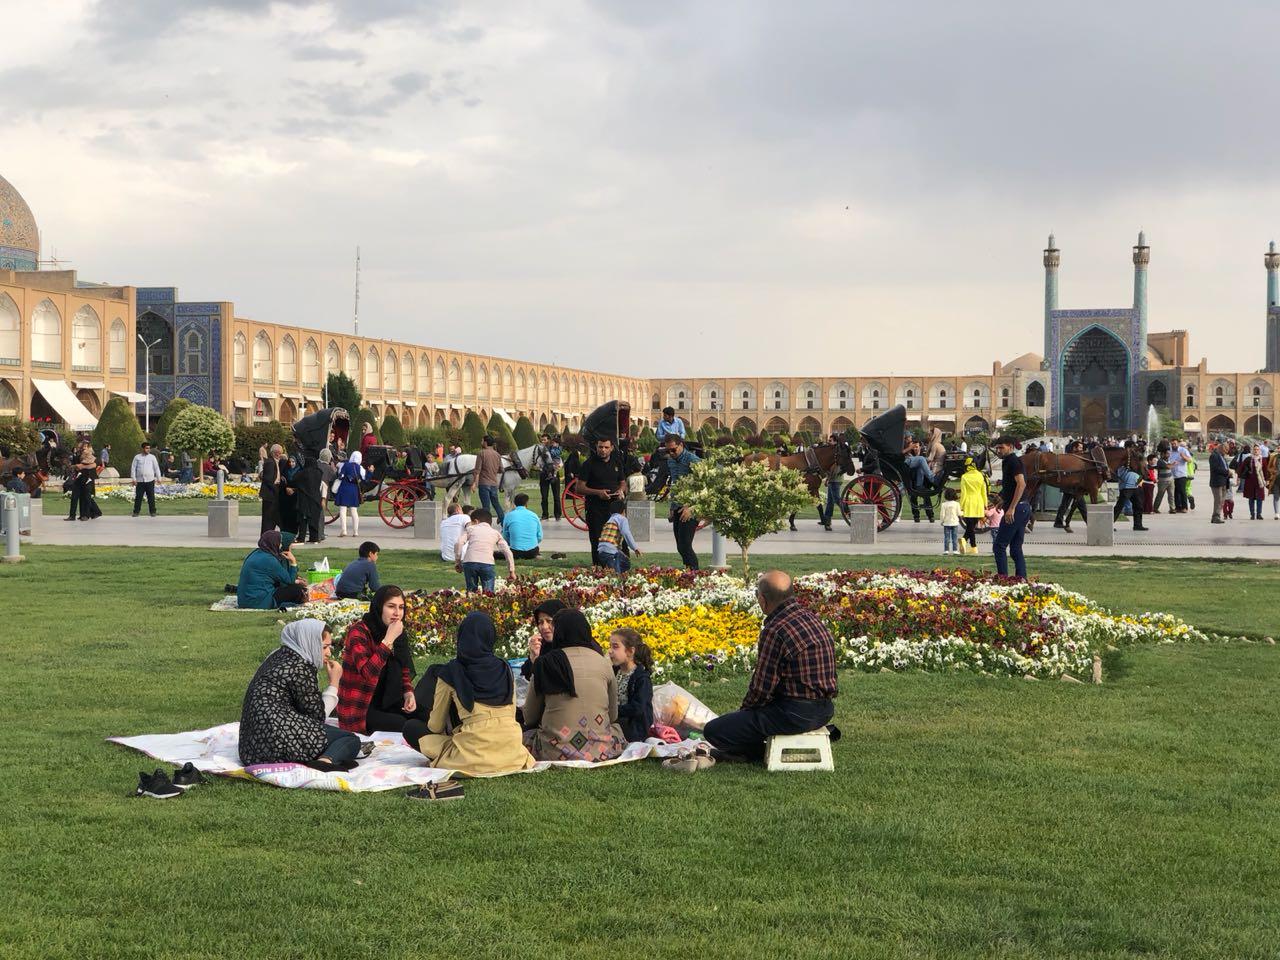 Day 1: Isfahan Safavid Era